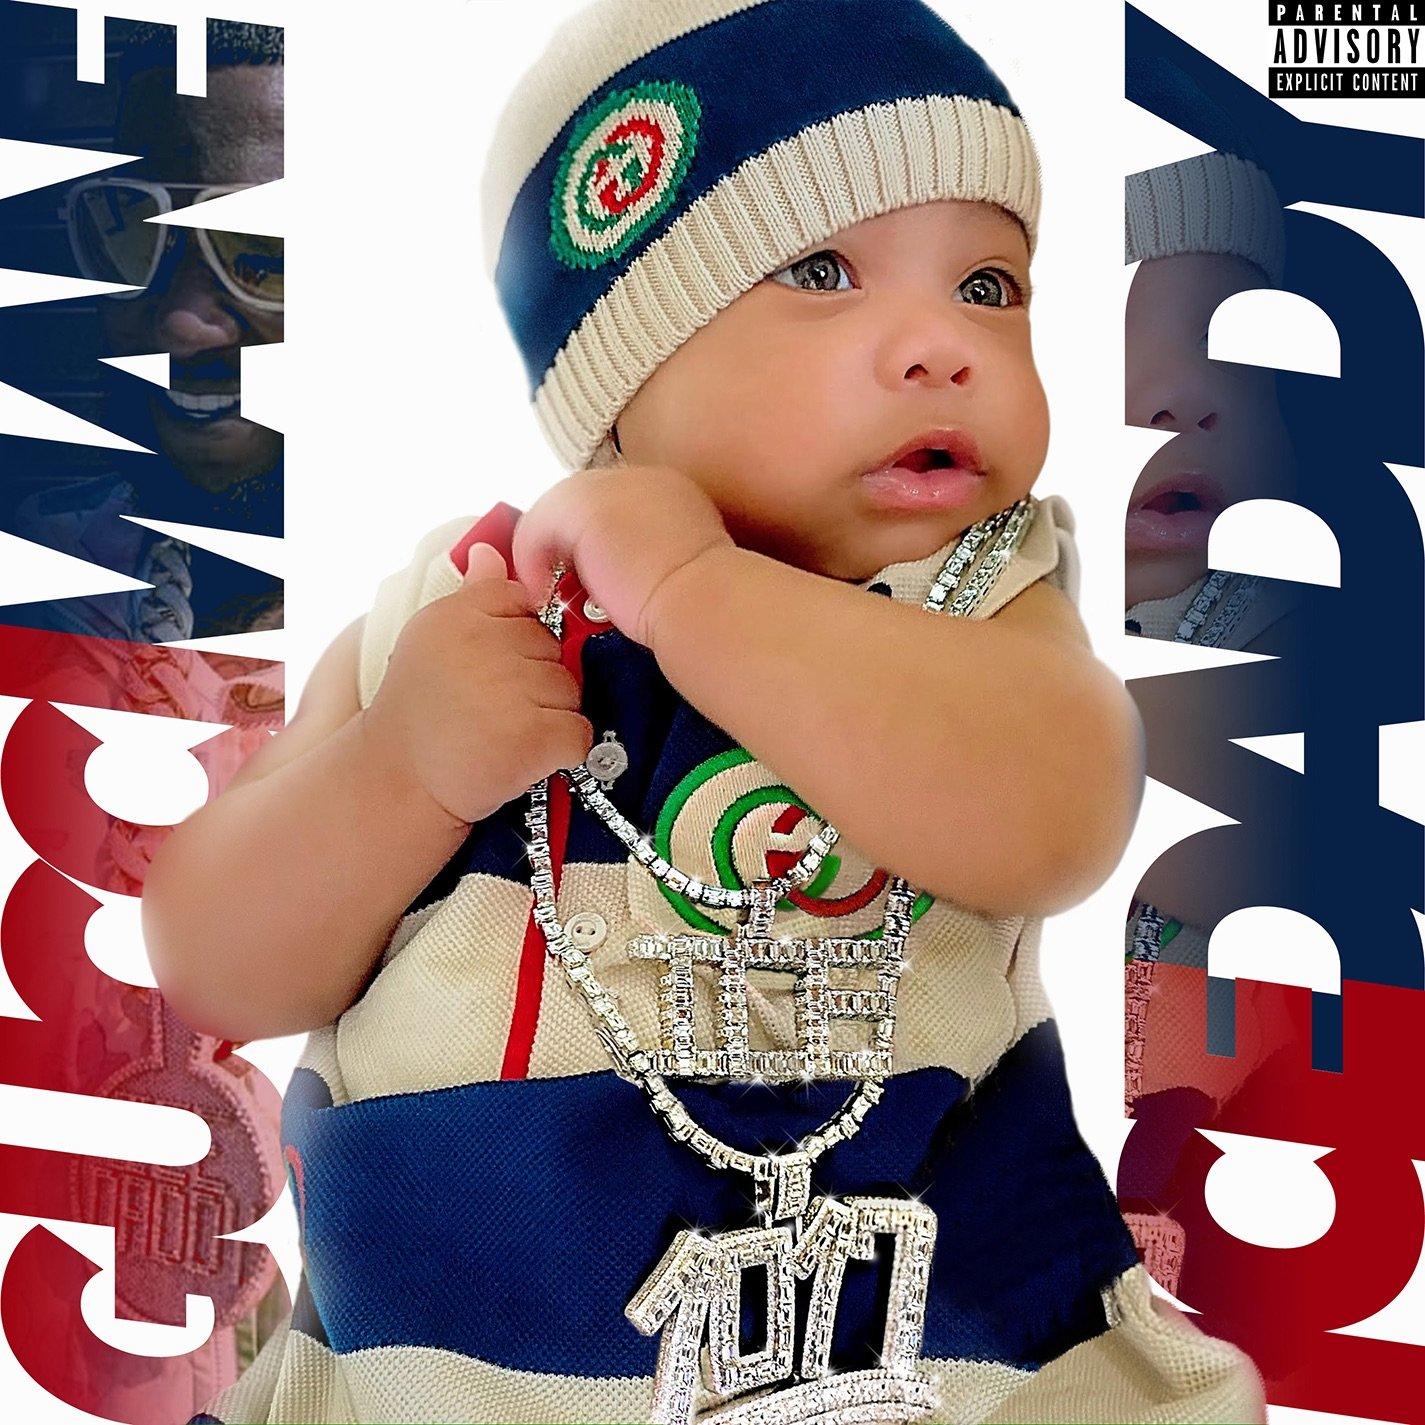 Gucci Mane 'Ice Daddy' Album